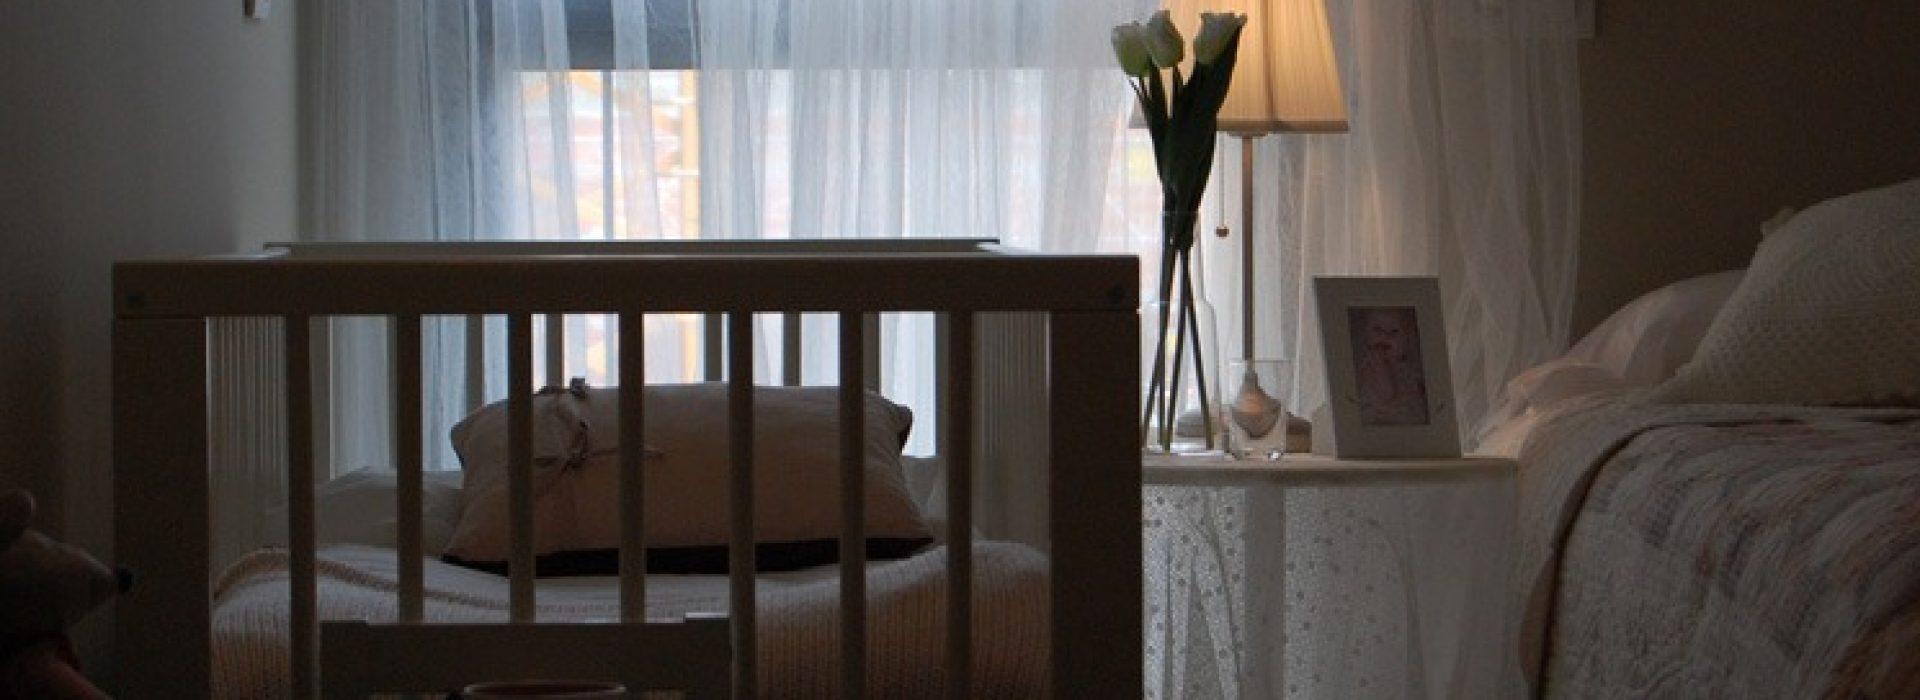 residencial-banyoles05